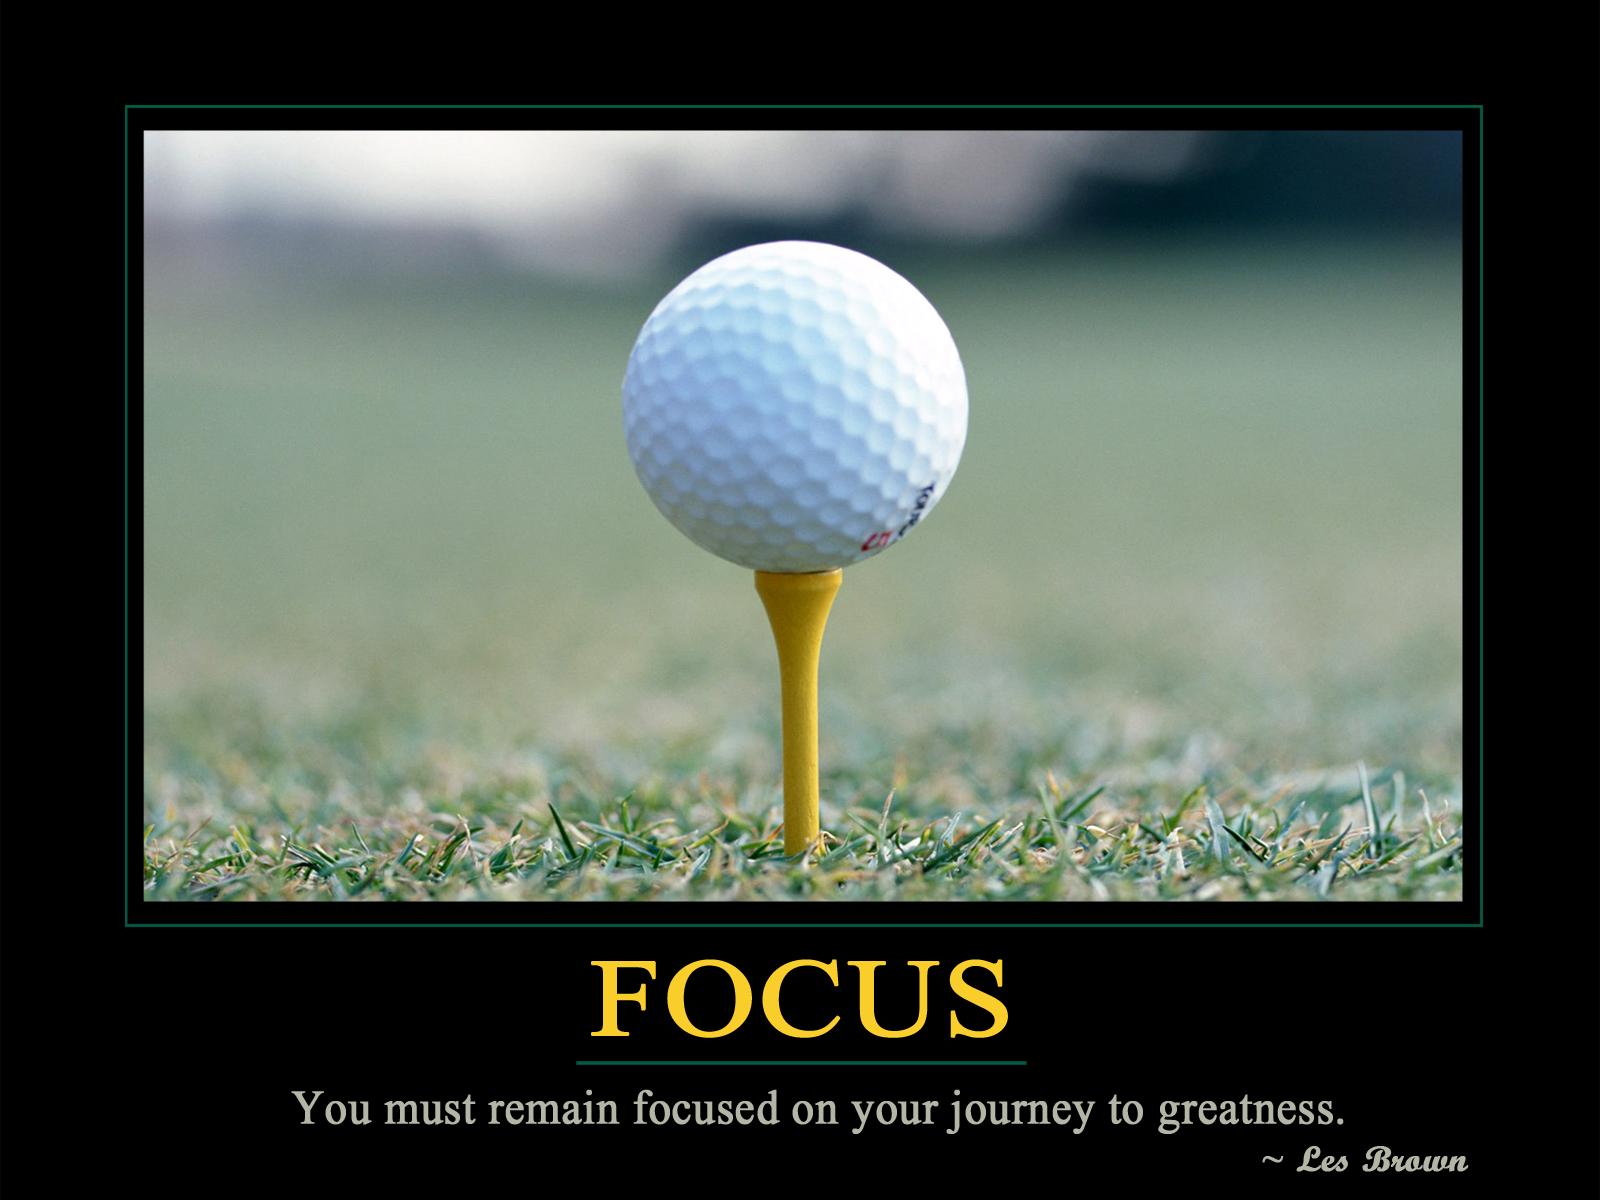 Motivational Wallpaper Focus Goal Setting Guide 1600x1200